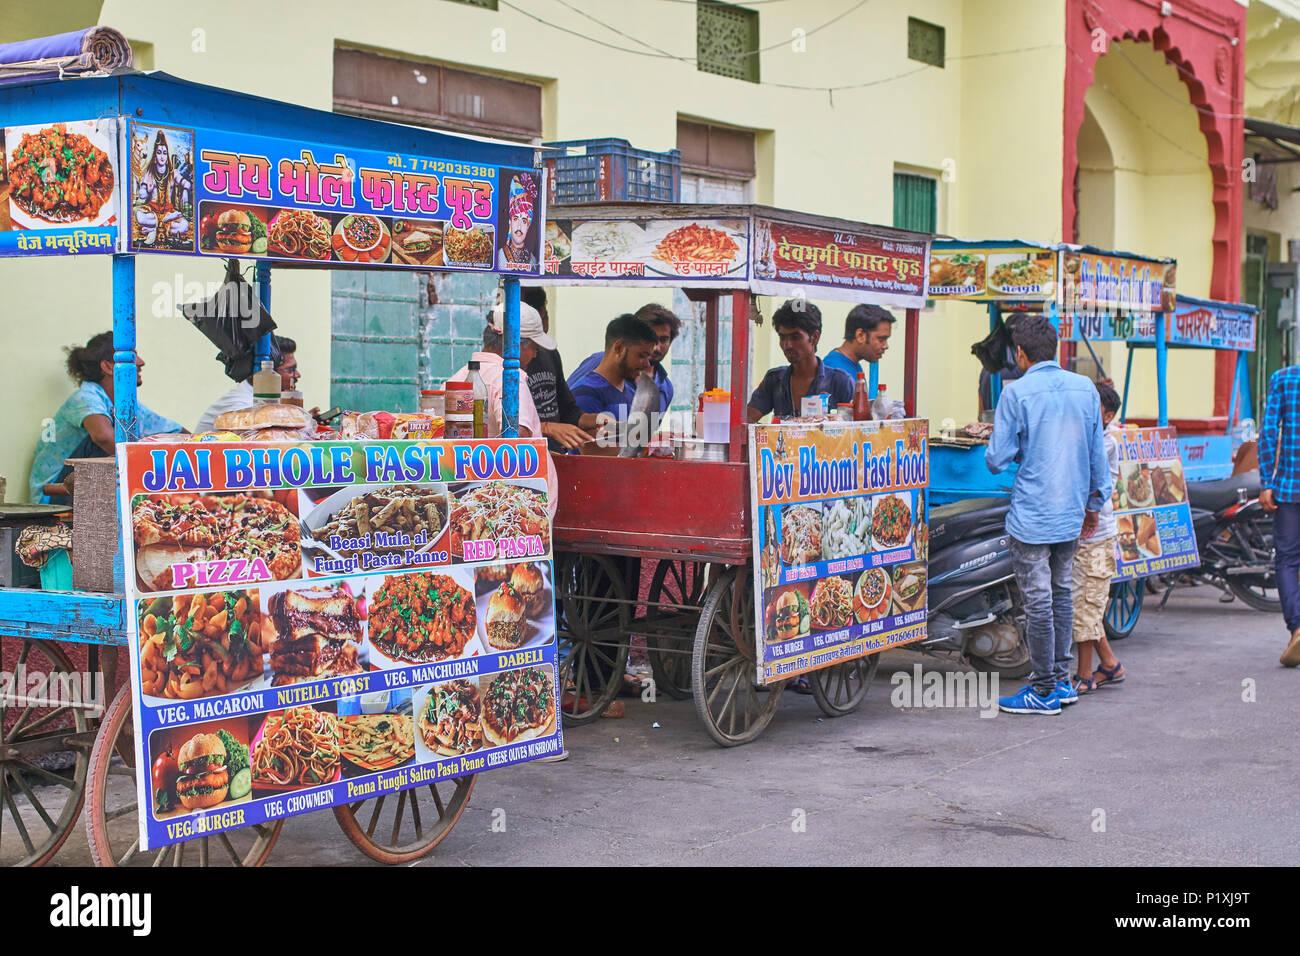 Street vendors selling food in Pushkar, India. - Stock Image